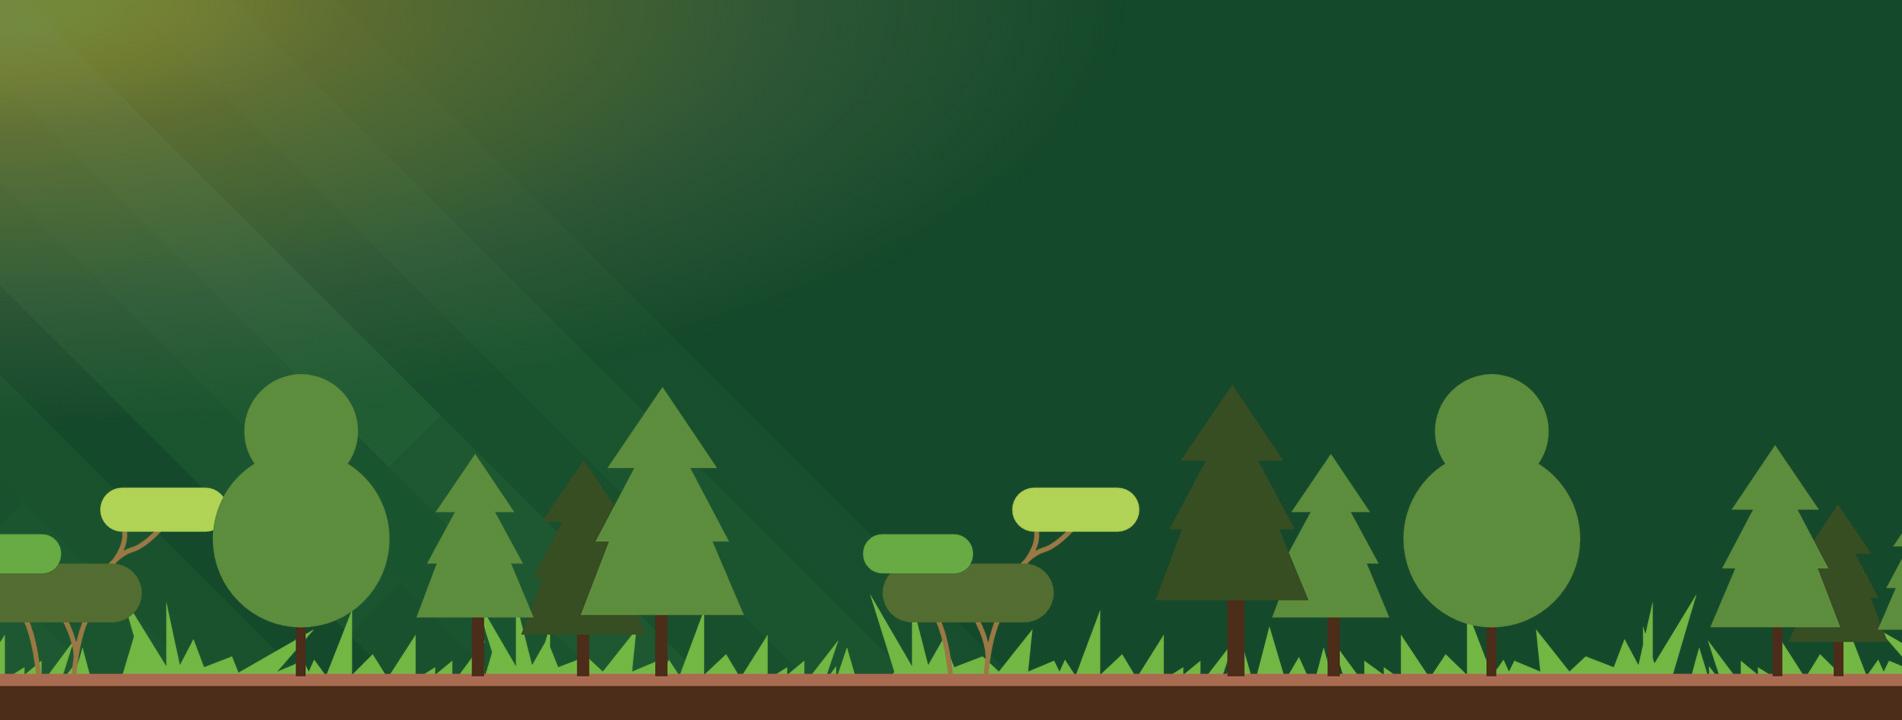 Turfhop Background